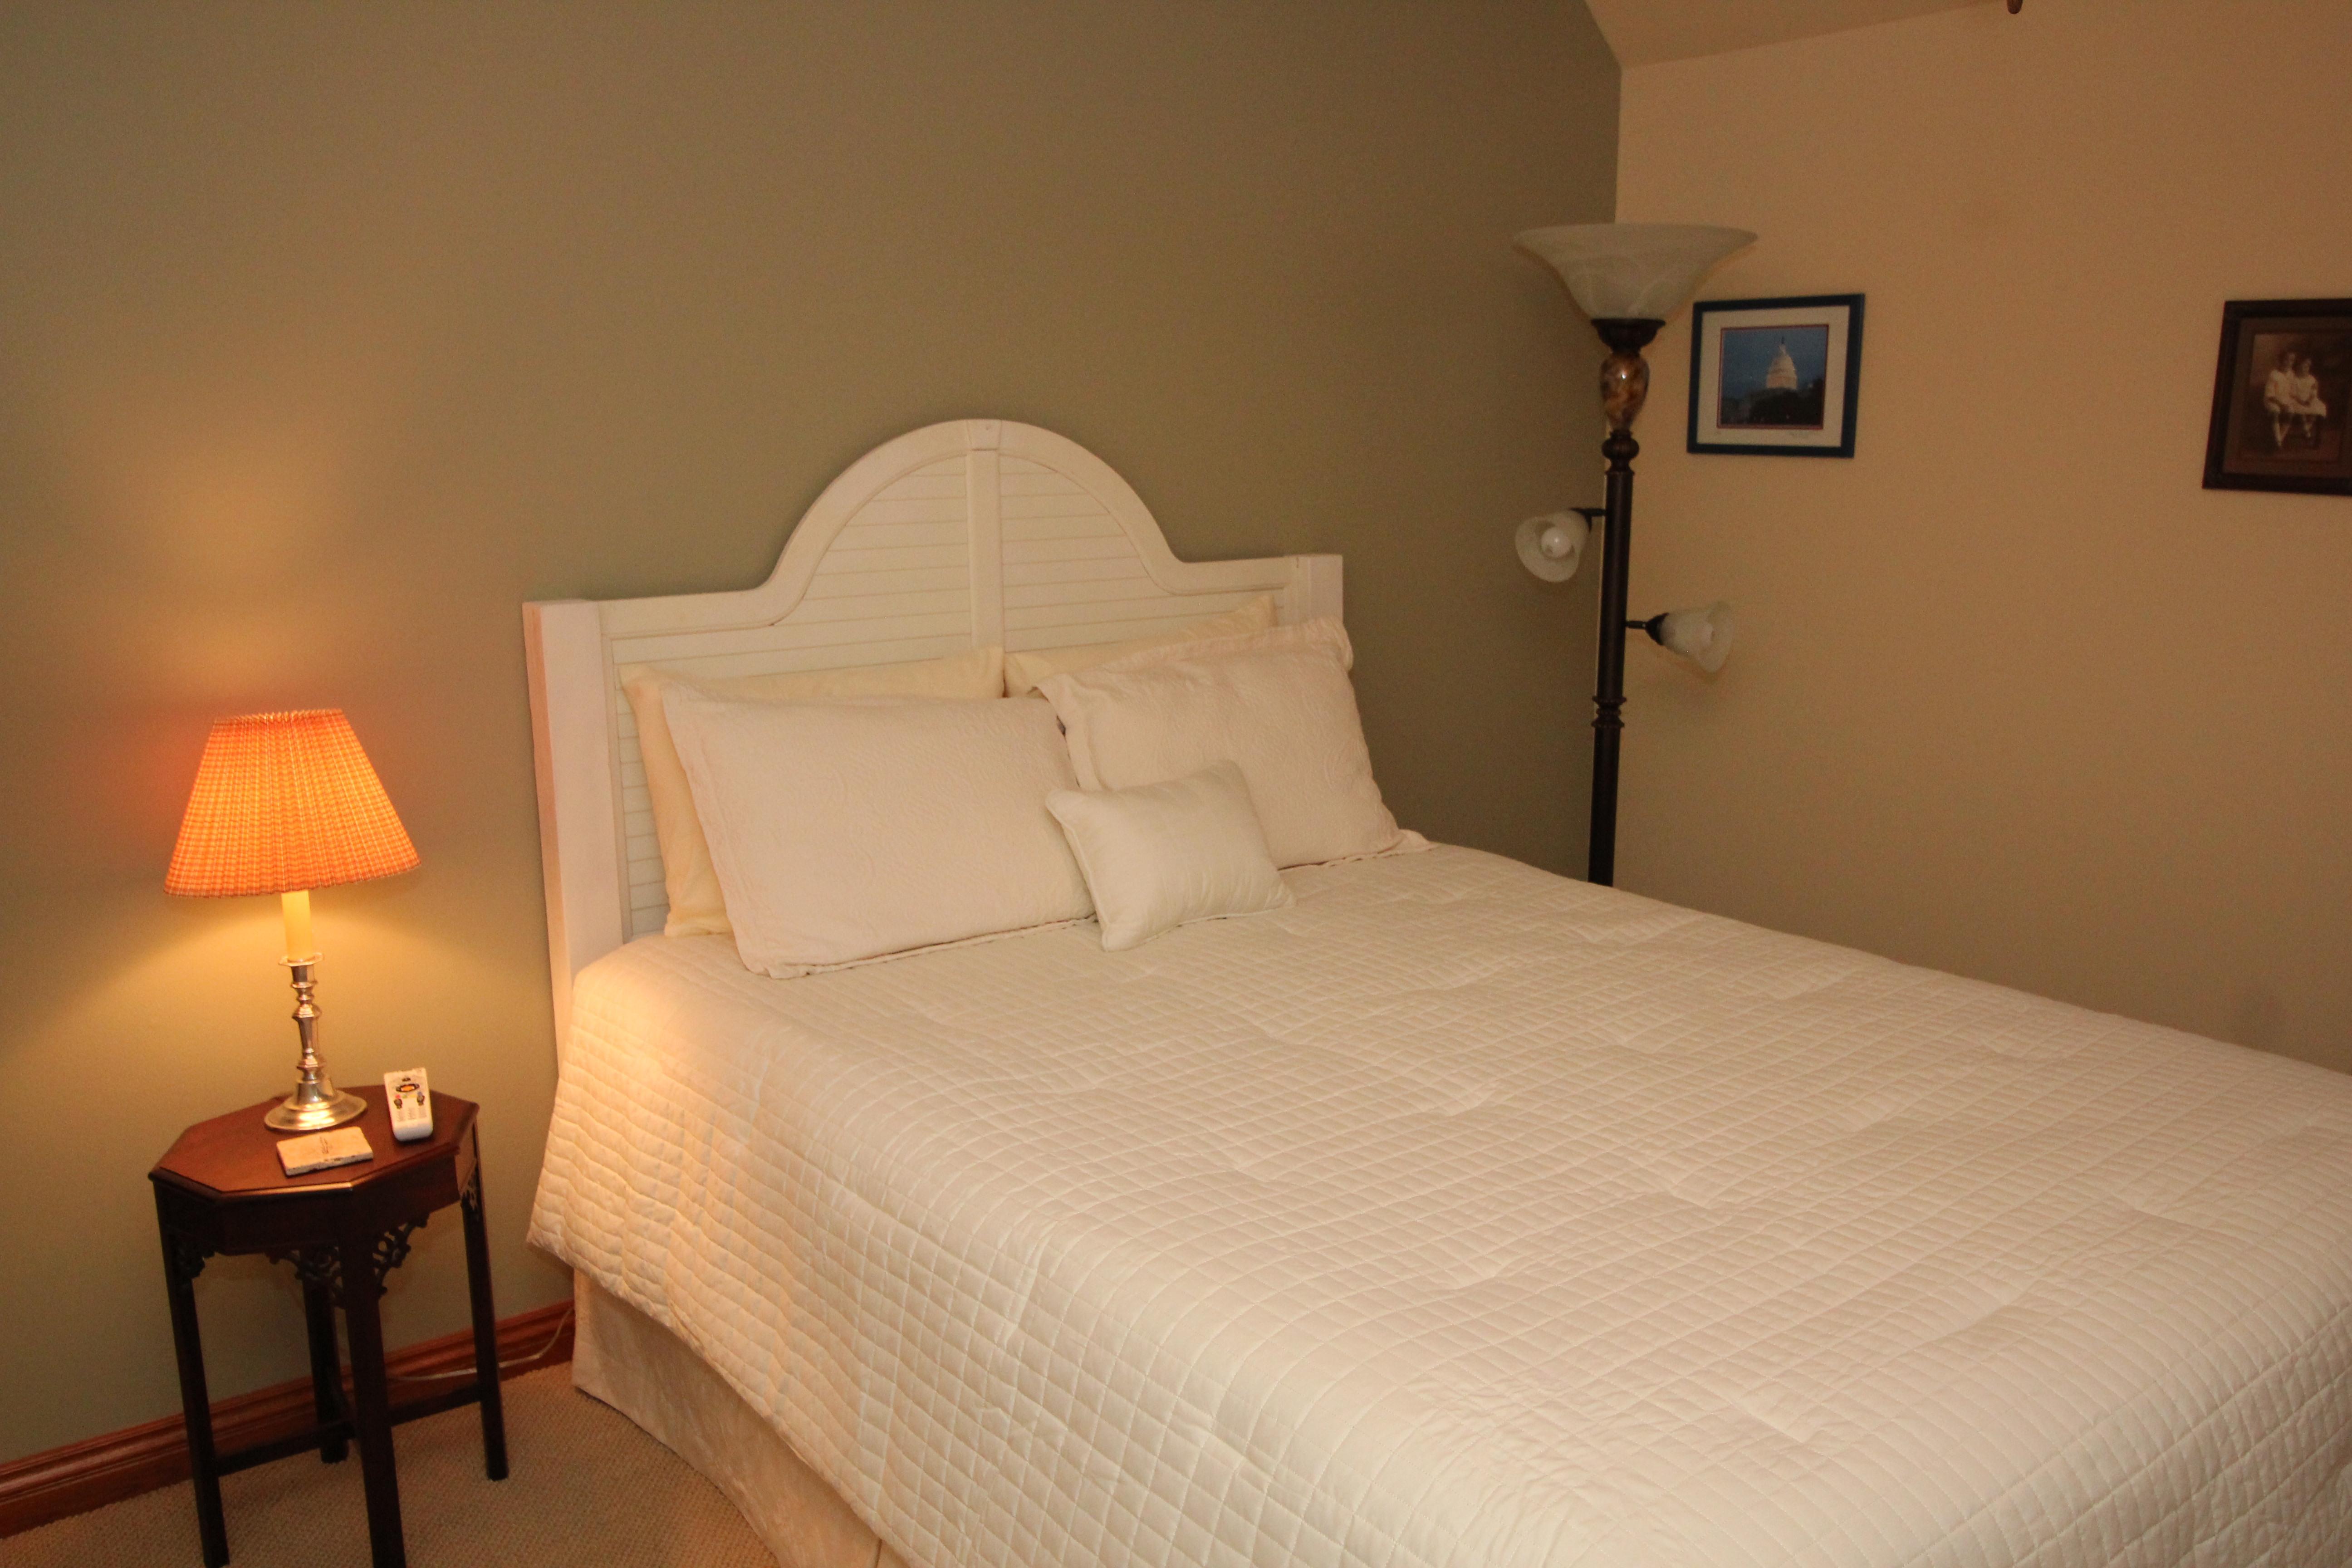 Queen Size Tempur-Pedic Bed